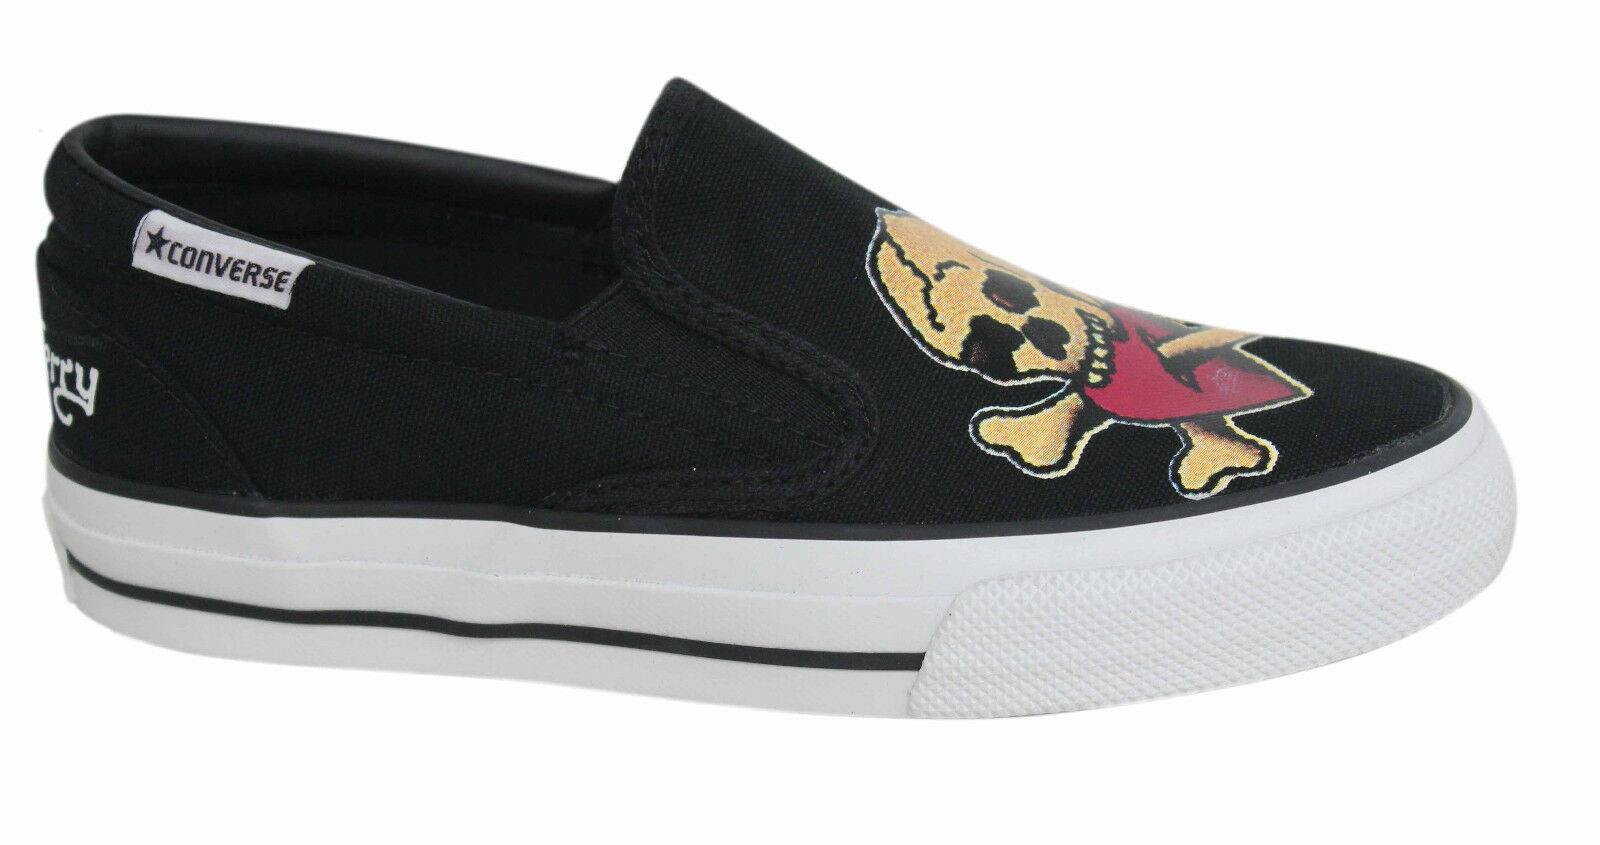 Converse Skid Grip EV Sailor Jerry Slip